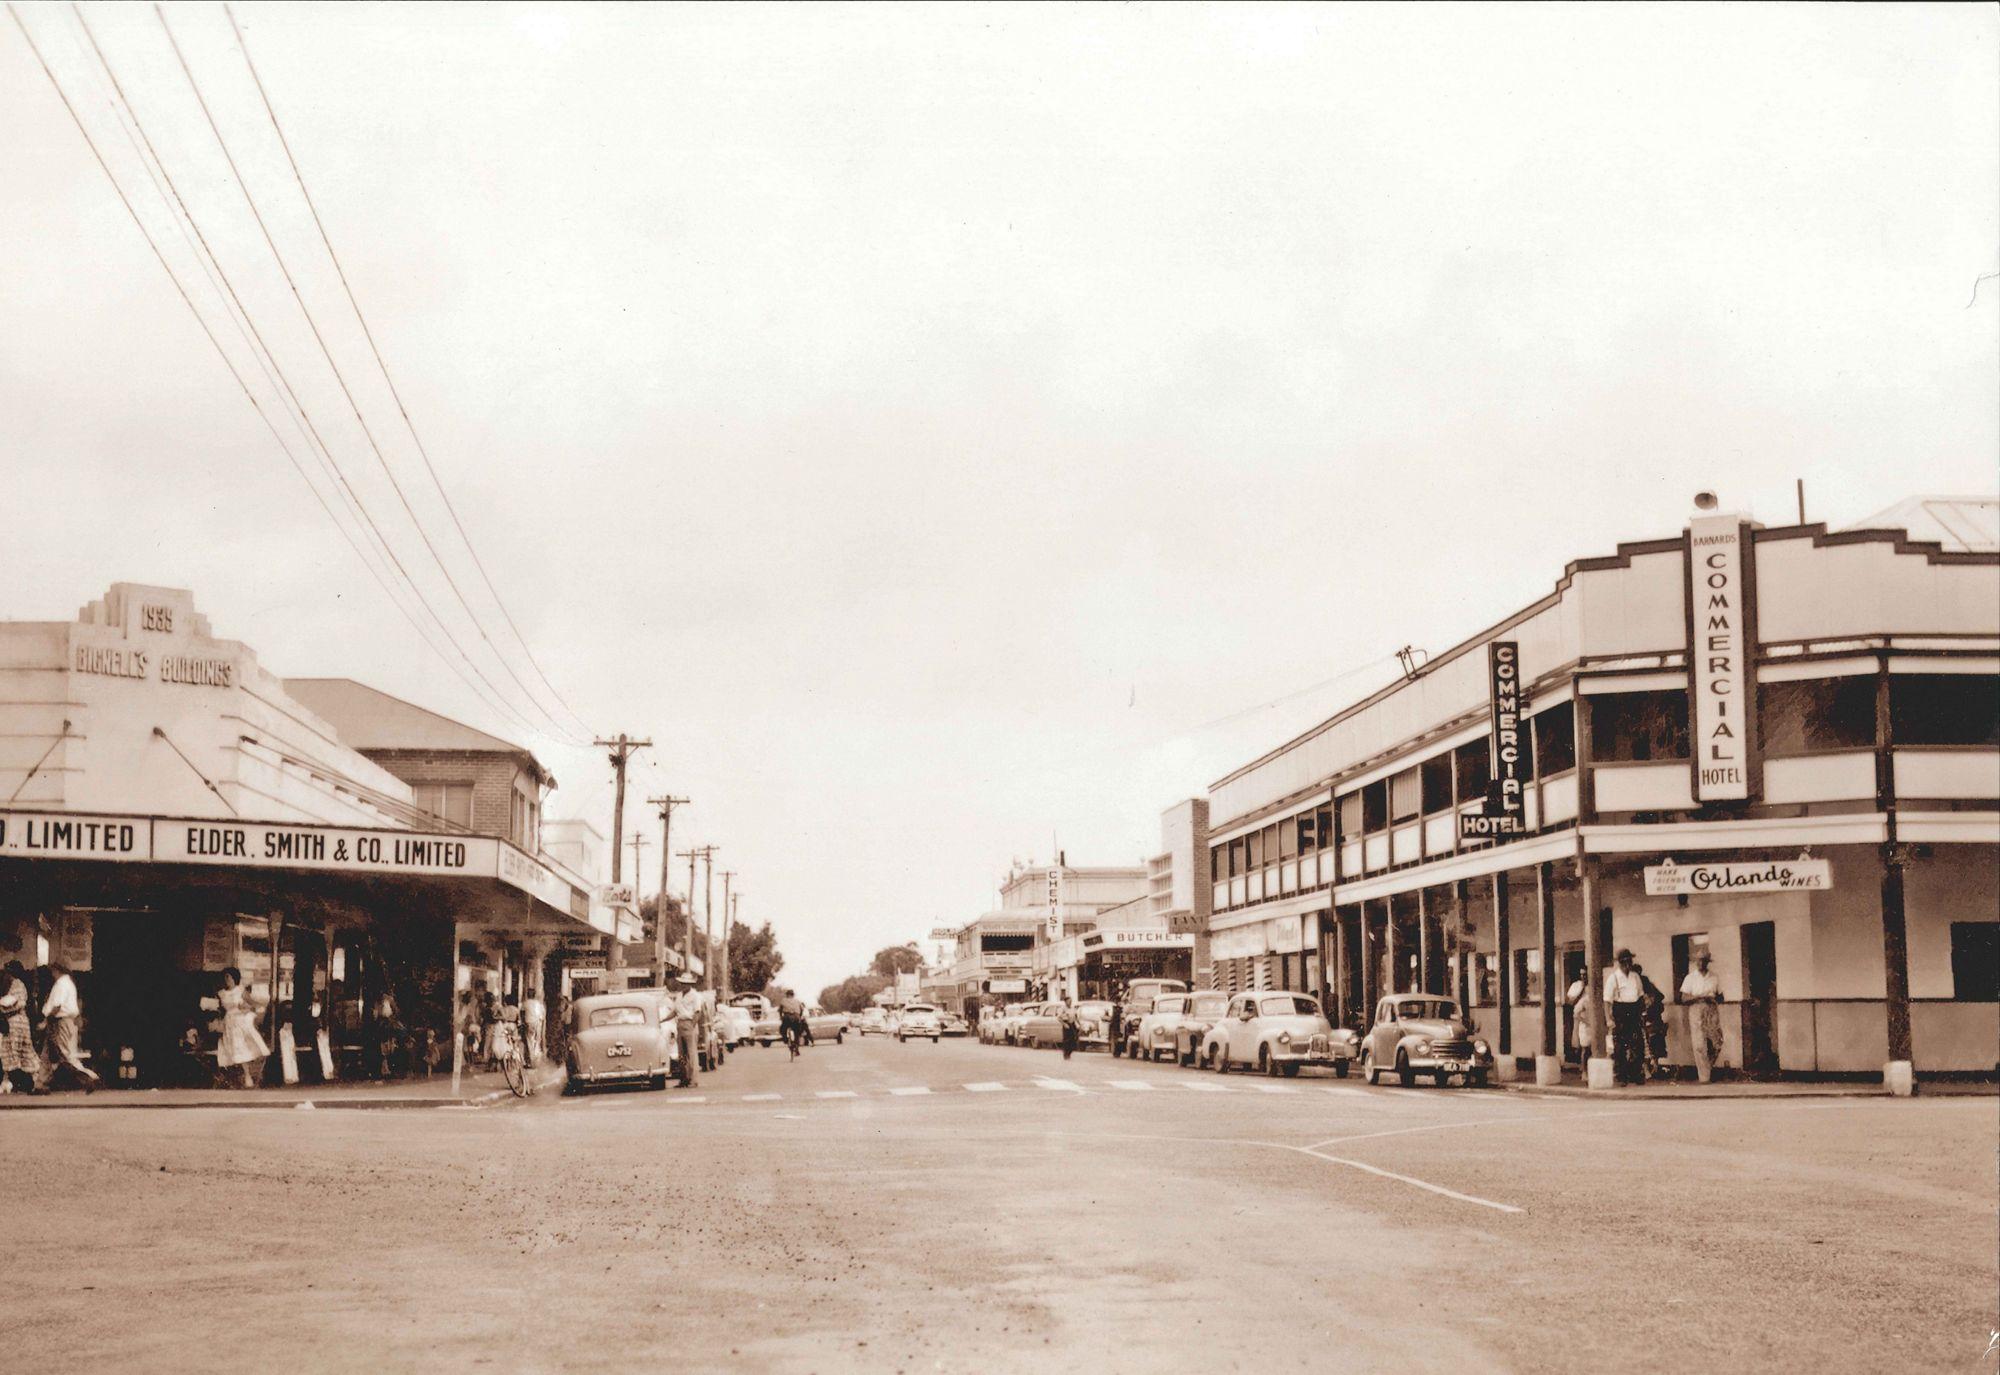 Cnr Queen & Alberts Sts, Busselton mid 1950s